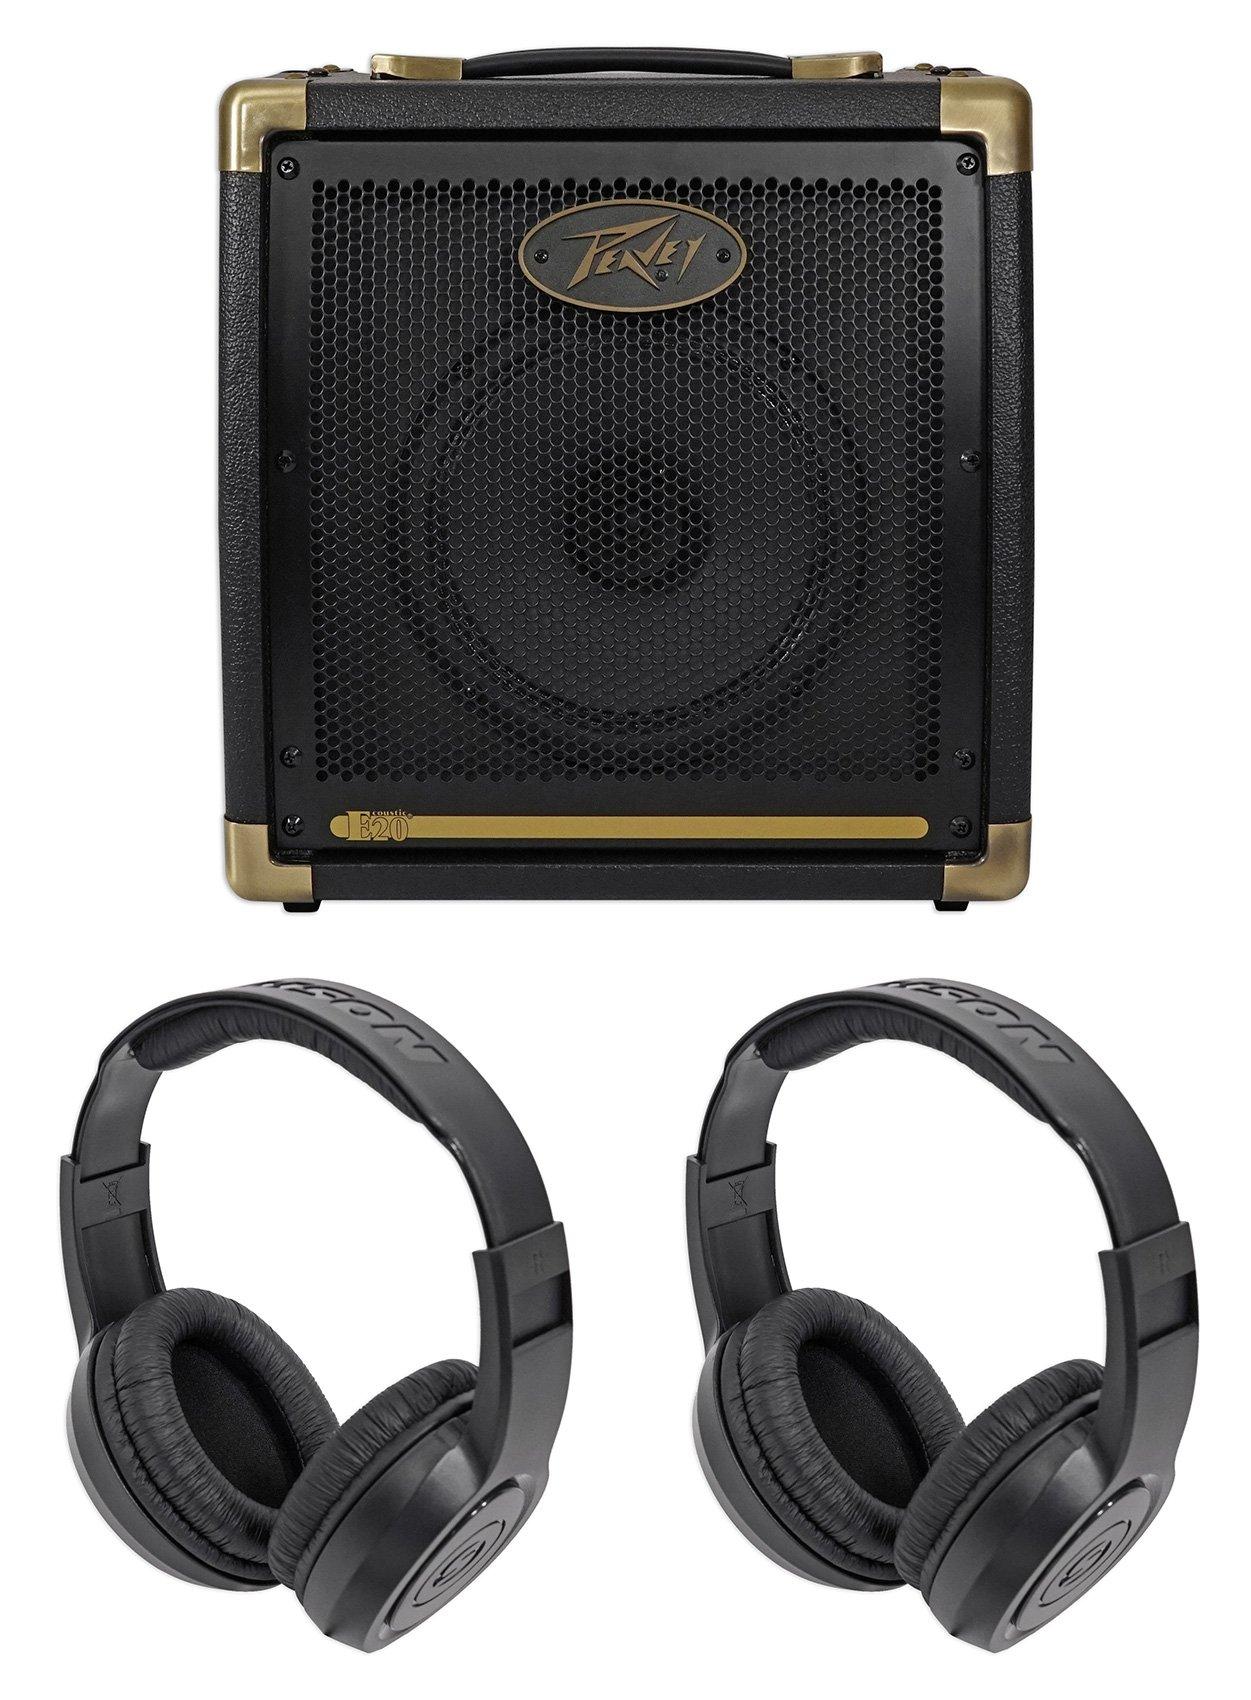 Peavey Ecoustic 20w Acoustic Guitar Amplifier Amp w/ 2-Ch.+8'' Speaker+Headphones